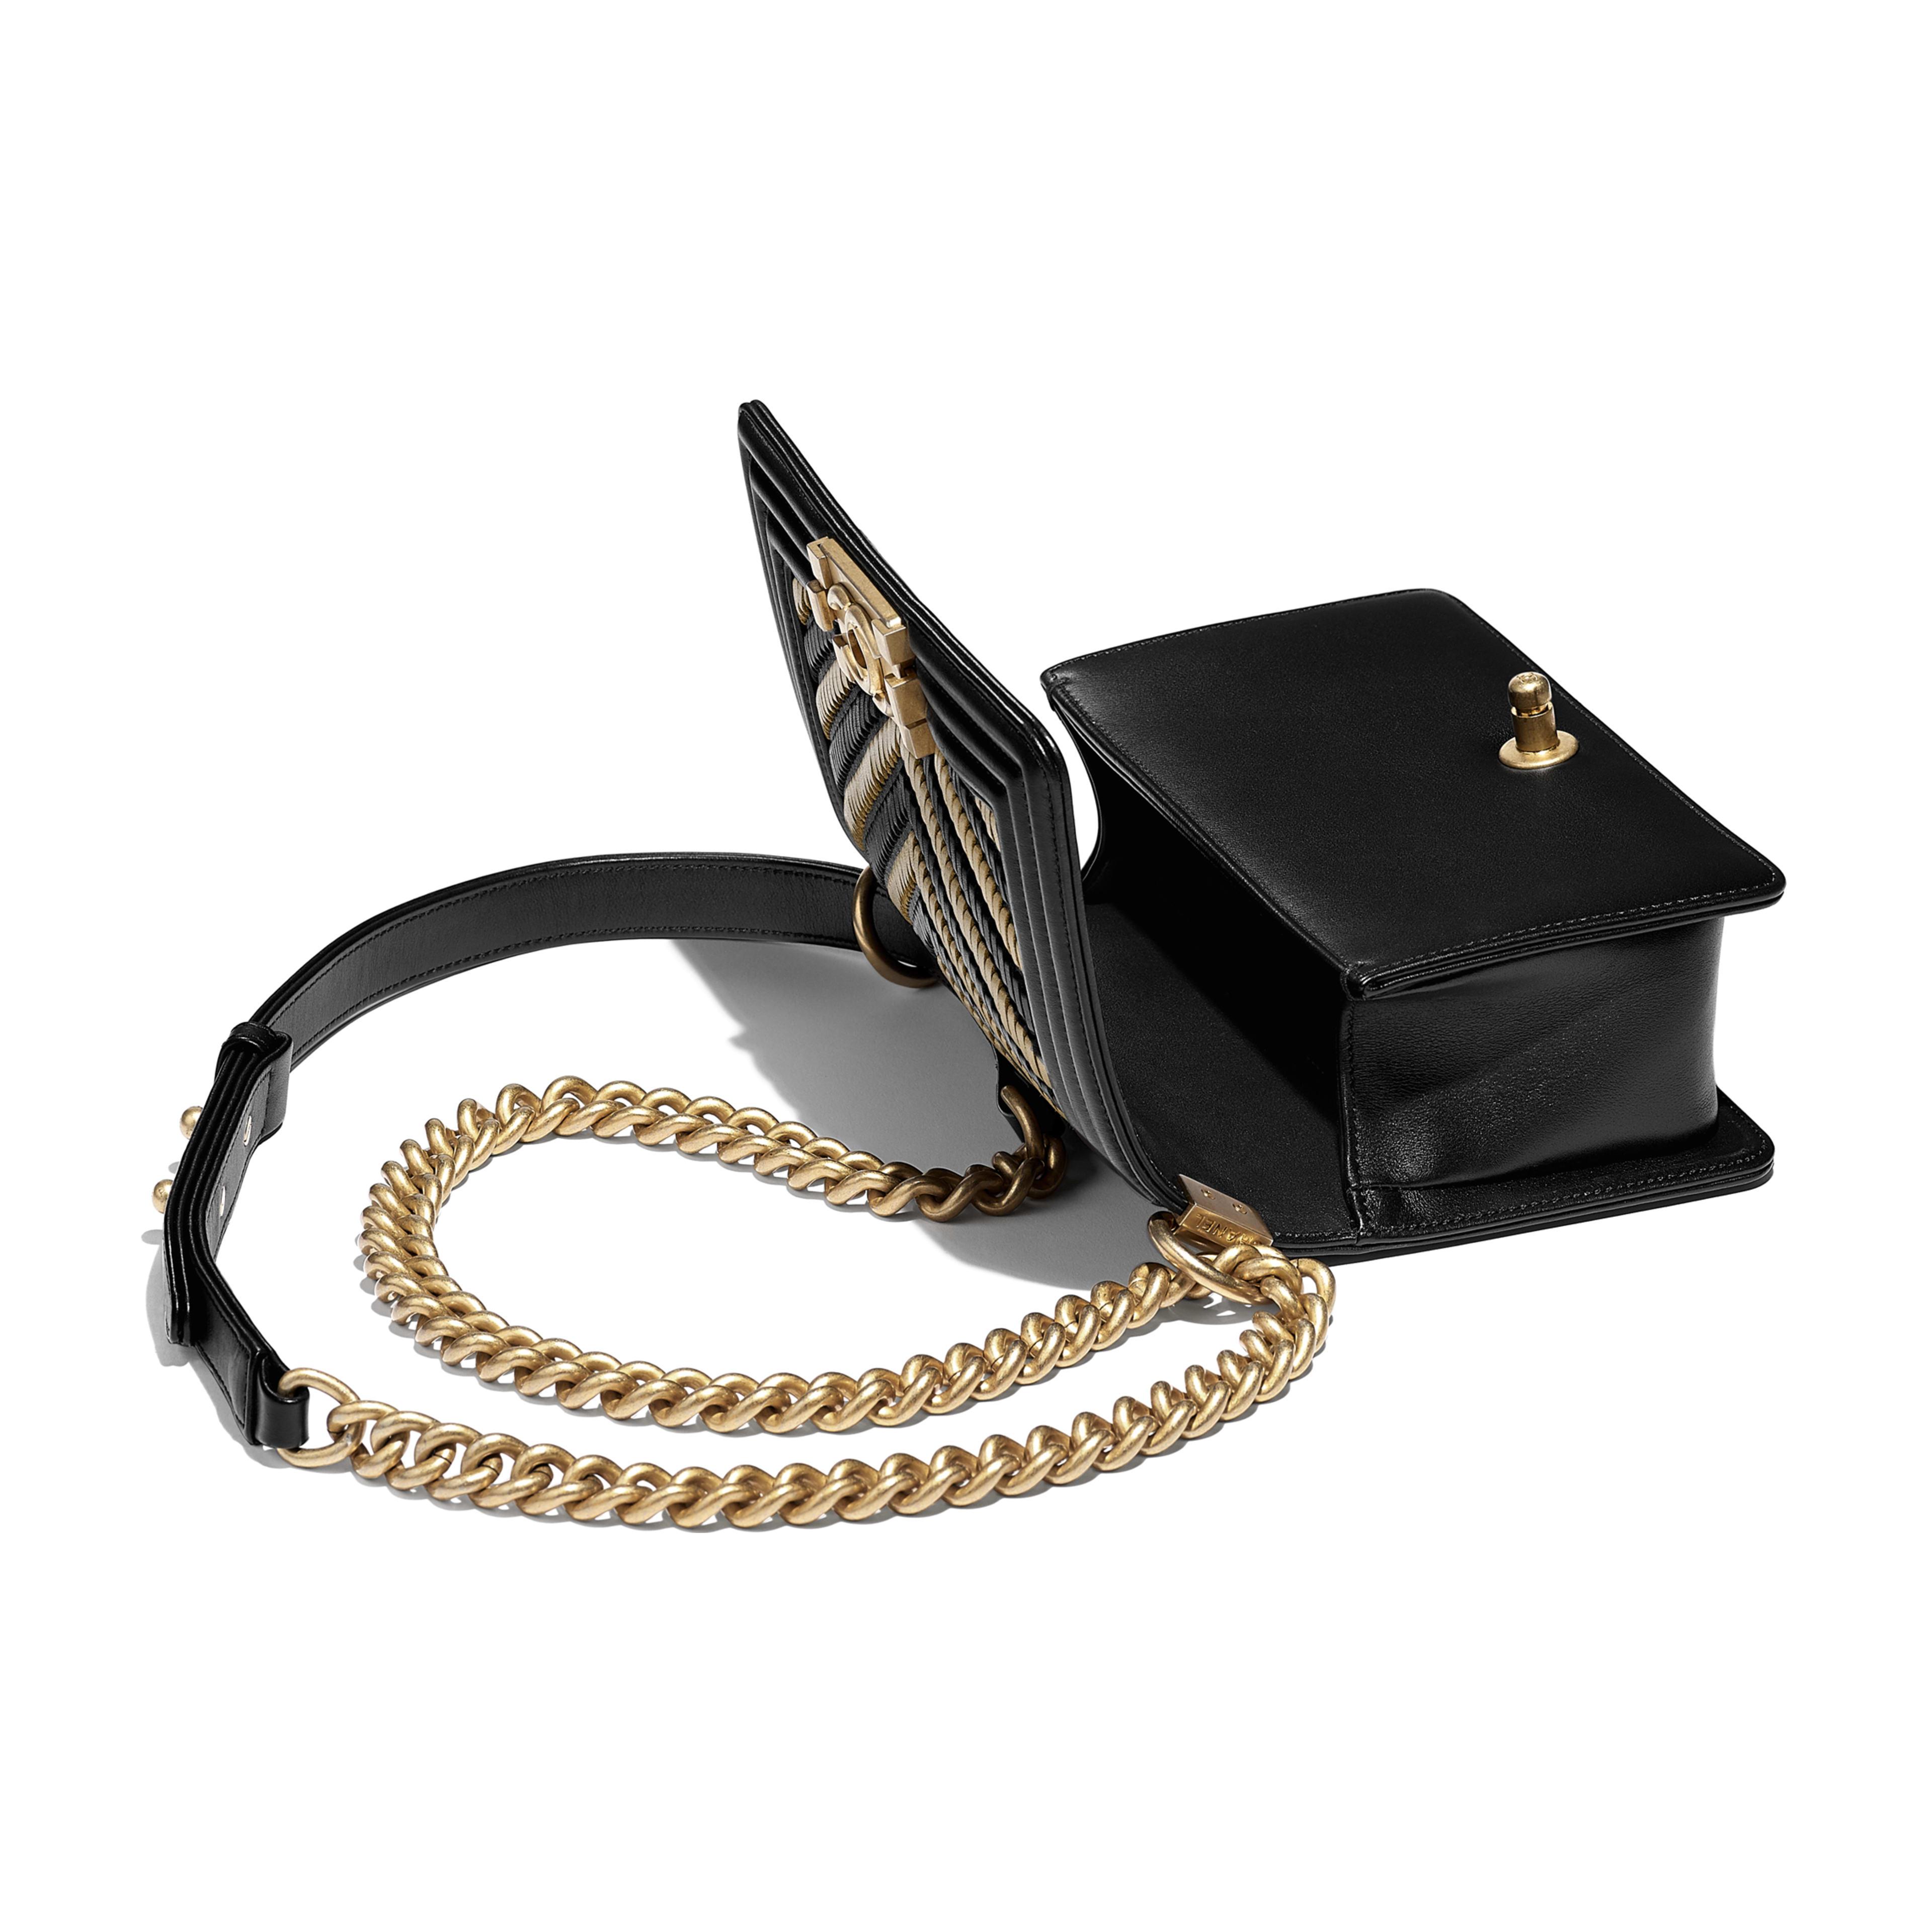 Small BOY CHANEL Handbag - Black & Gold - Metallic Lambskin, Calfskin & Gold-Tone Metal - Other view - see full sized version